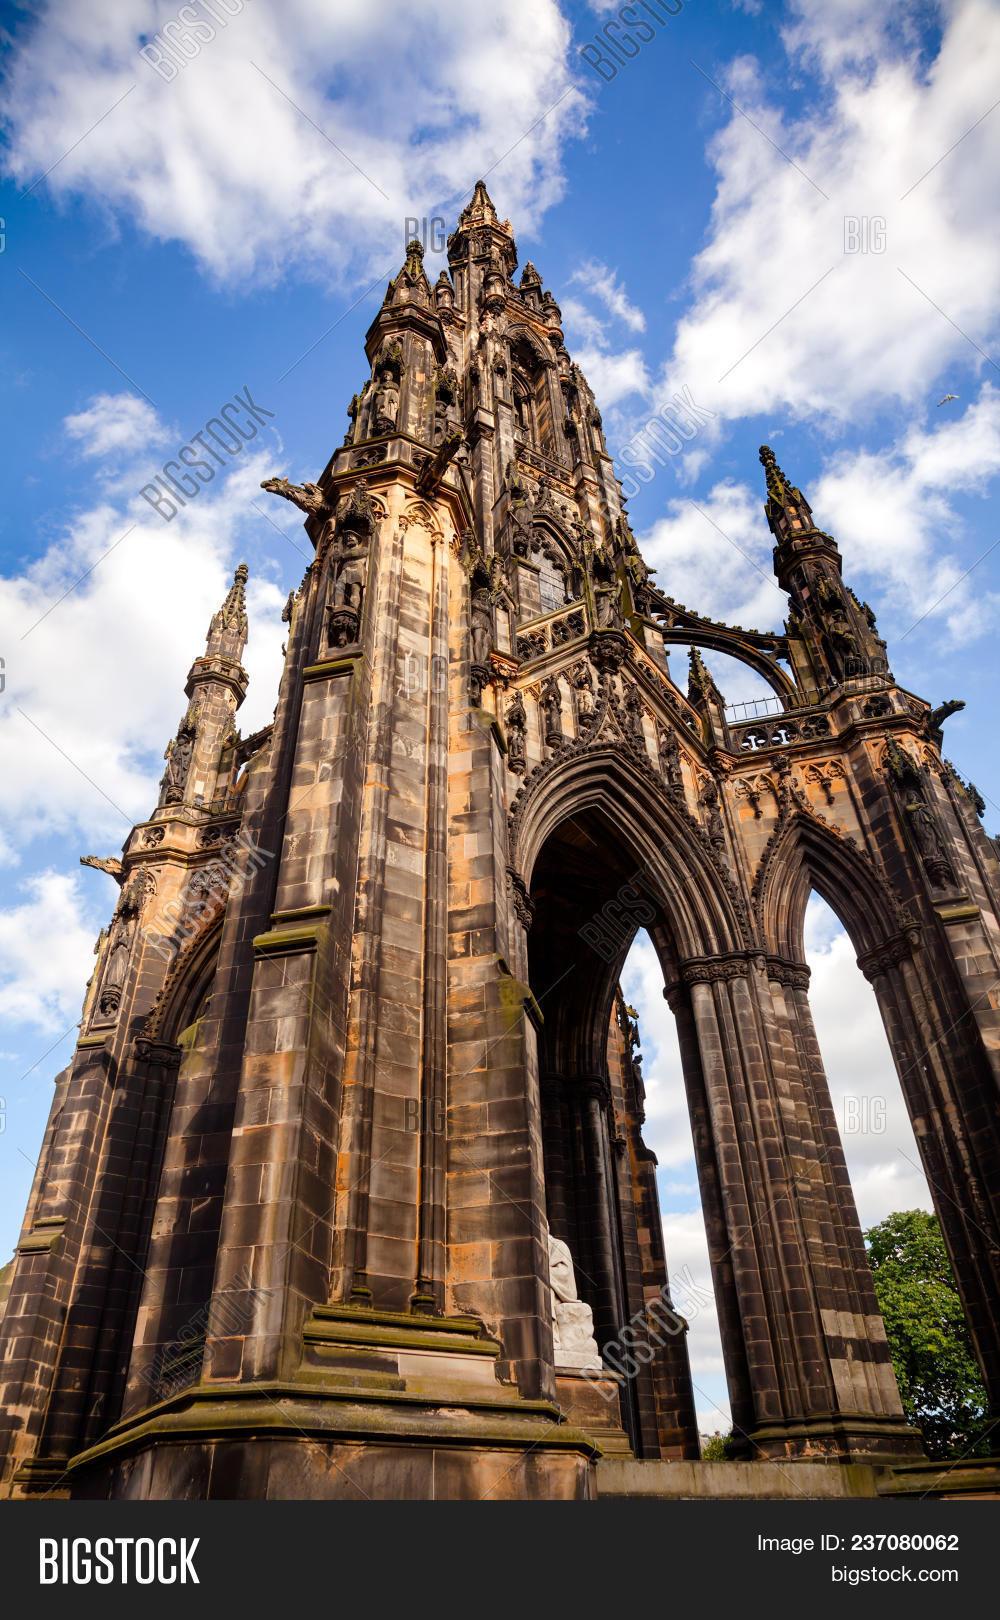 Victorian Gothic Image & Photo (Free Trial) | Bigstock